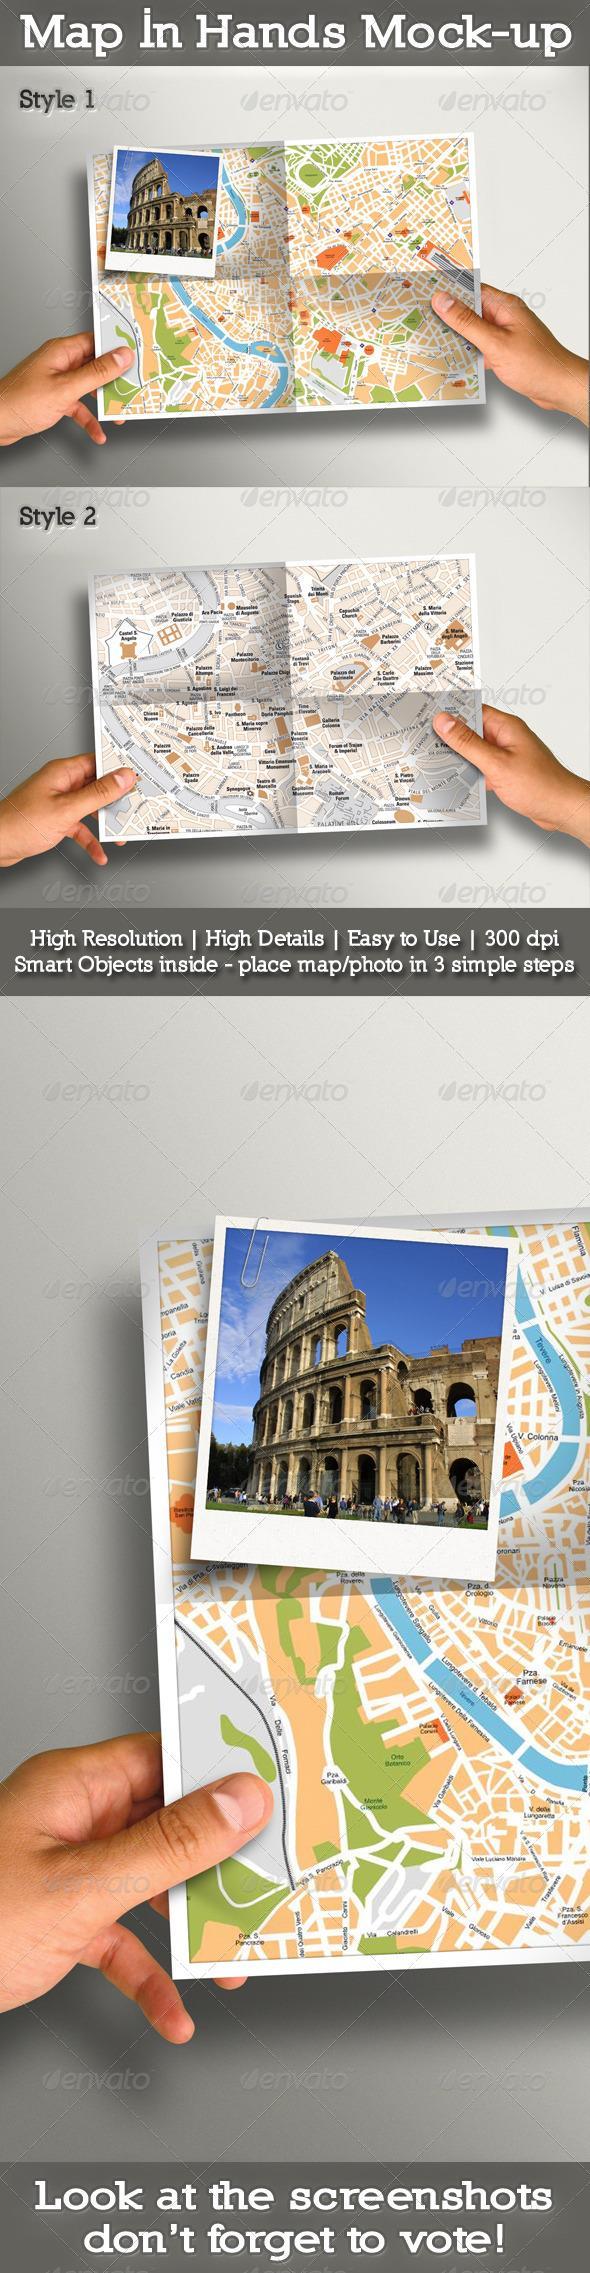 Map In Hands Mock Up I N Hands Mockup Photoshop Textures